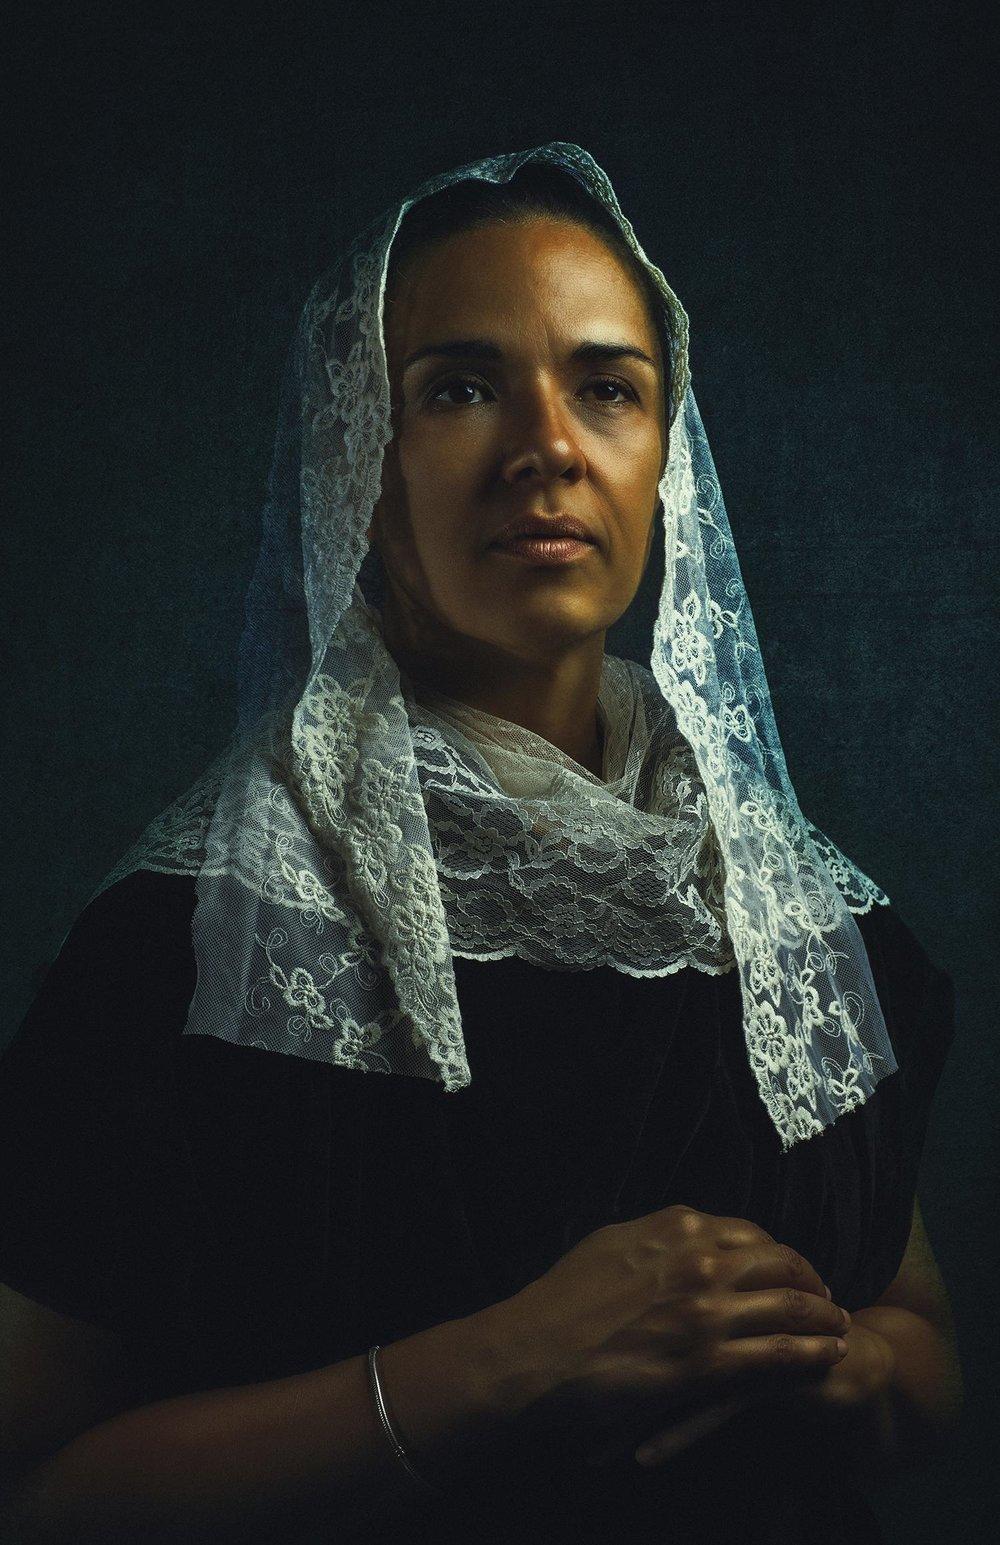 Saint Abyssinian, 2017 © Alanna Airitam